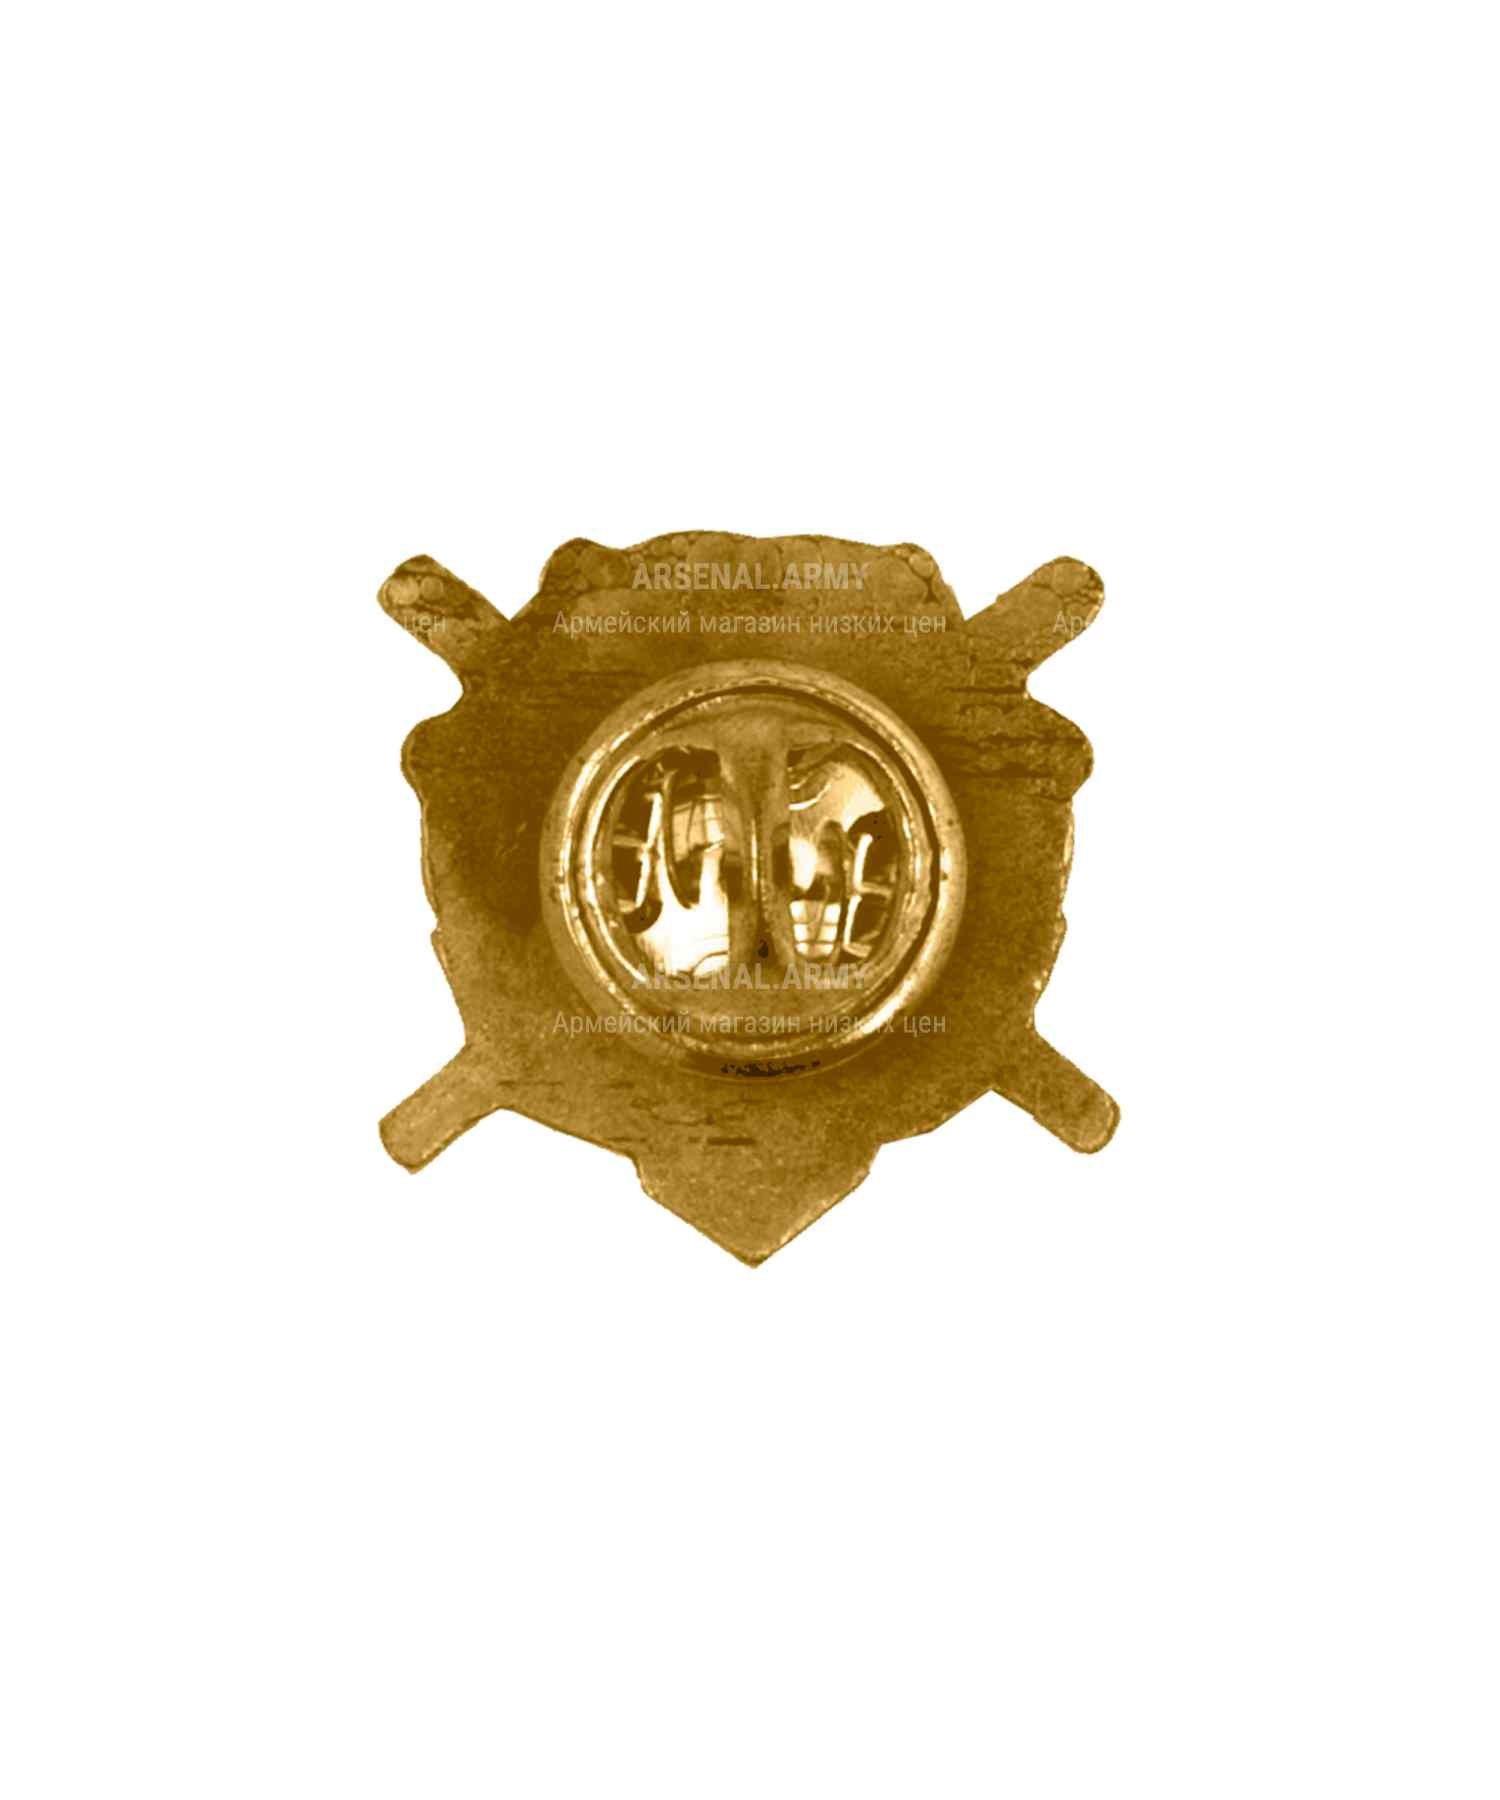 Значок металлический ГАИ Транспортная милиция